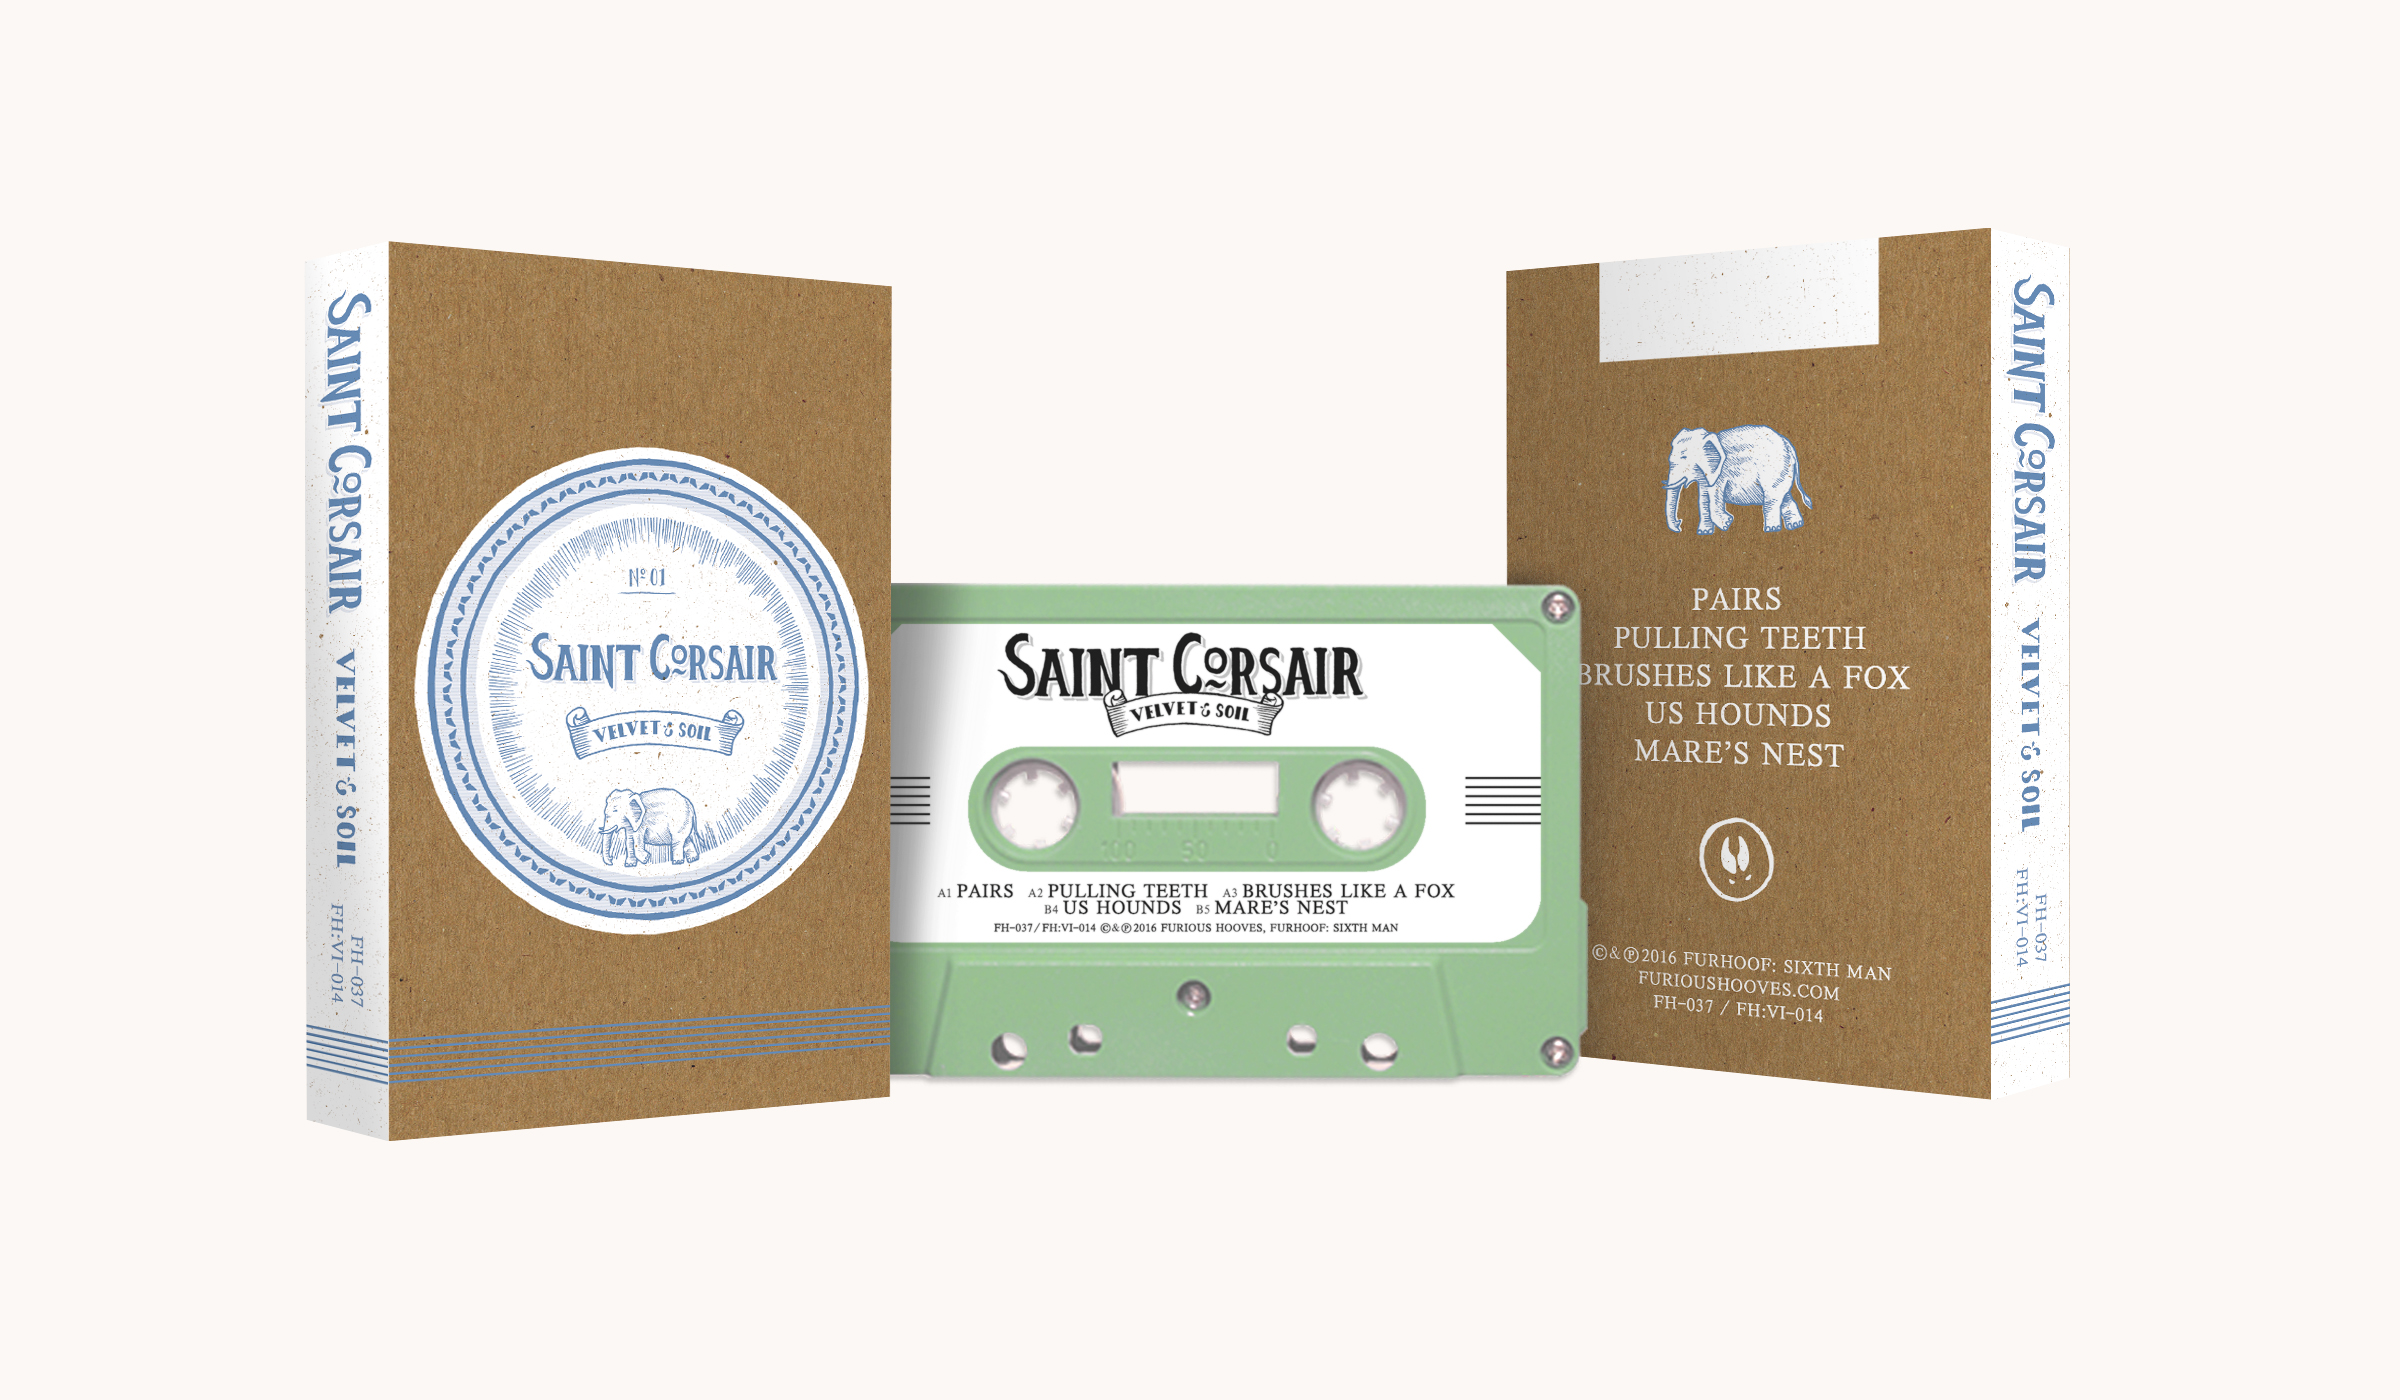 FHVI-014 Saint Corsair CS_mintgreen.jpg